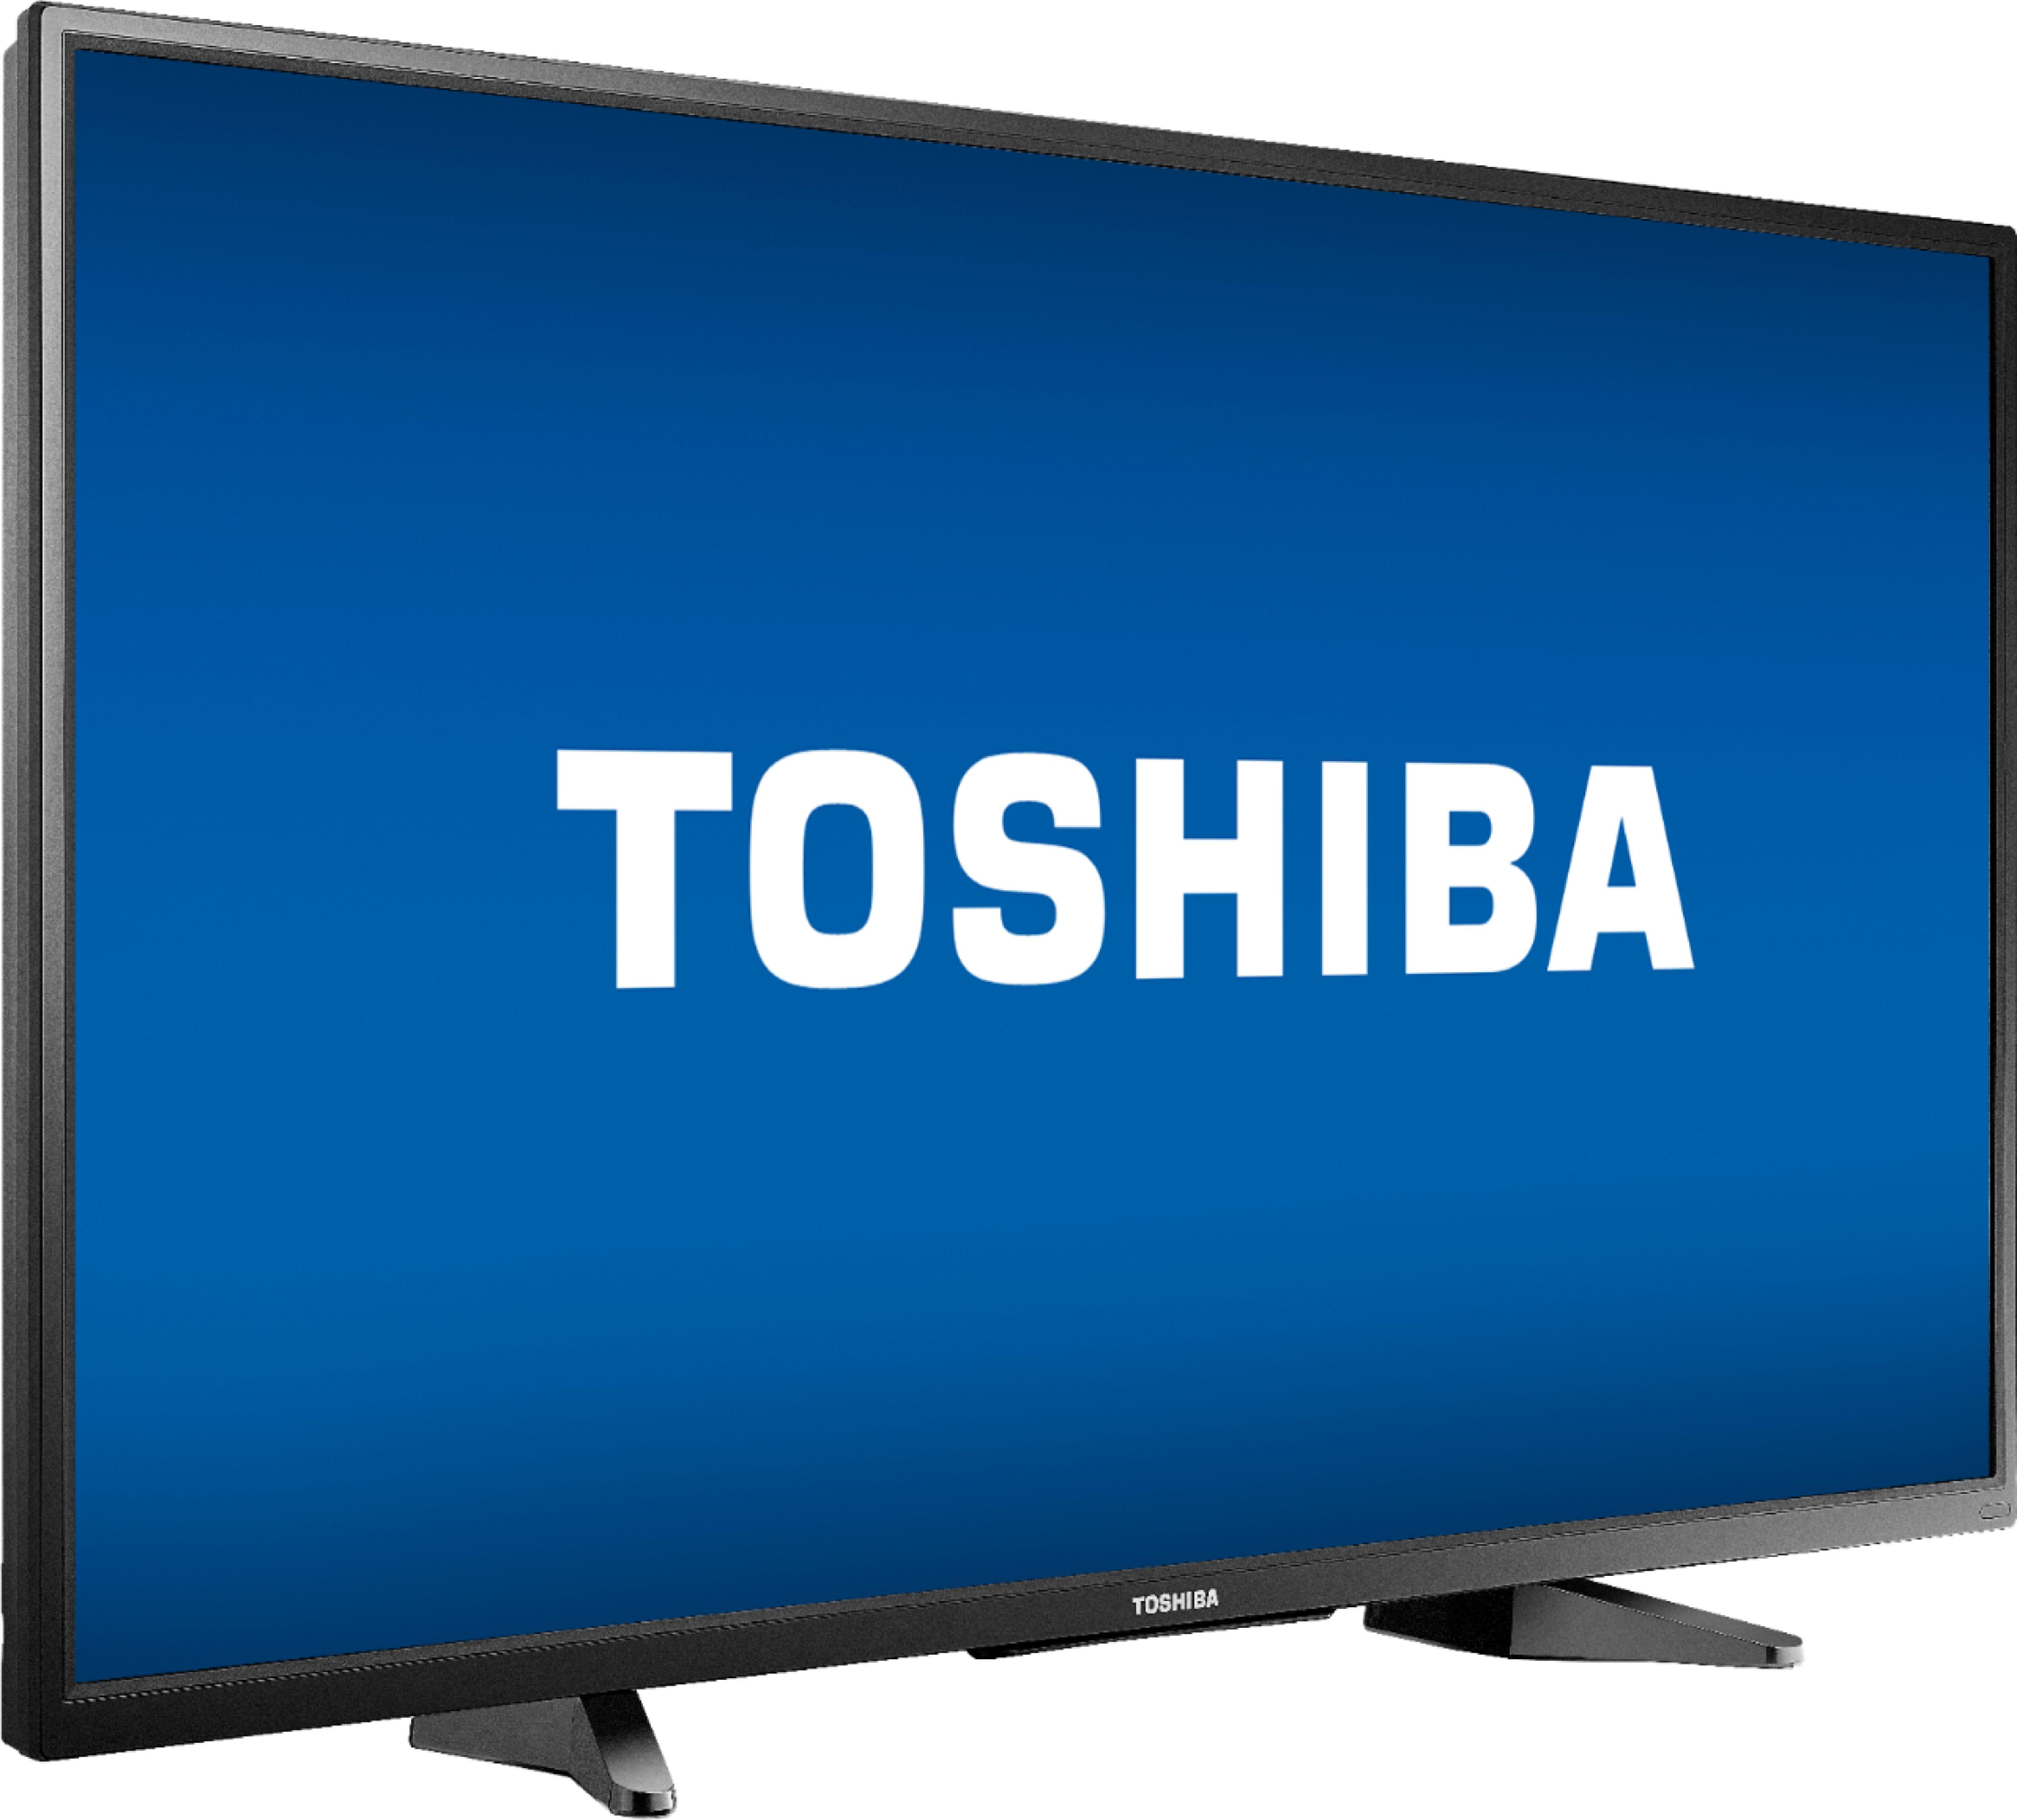 Toshiba TF-50A810U19 angleImage